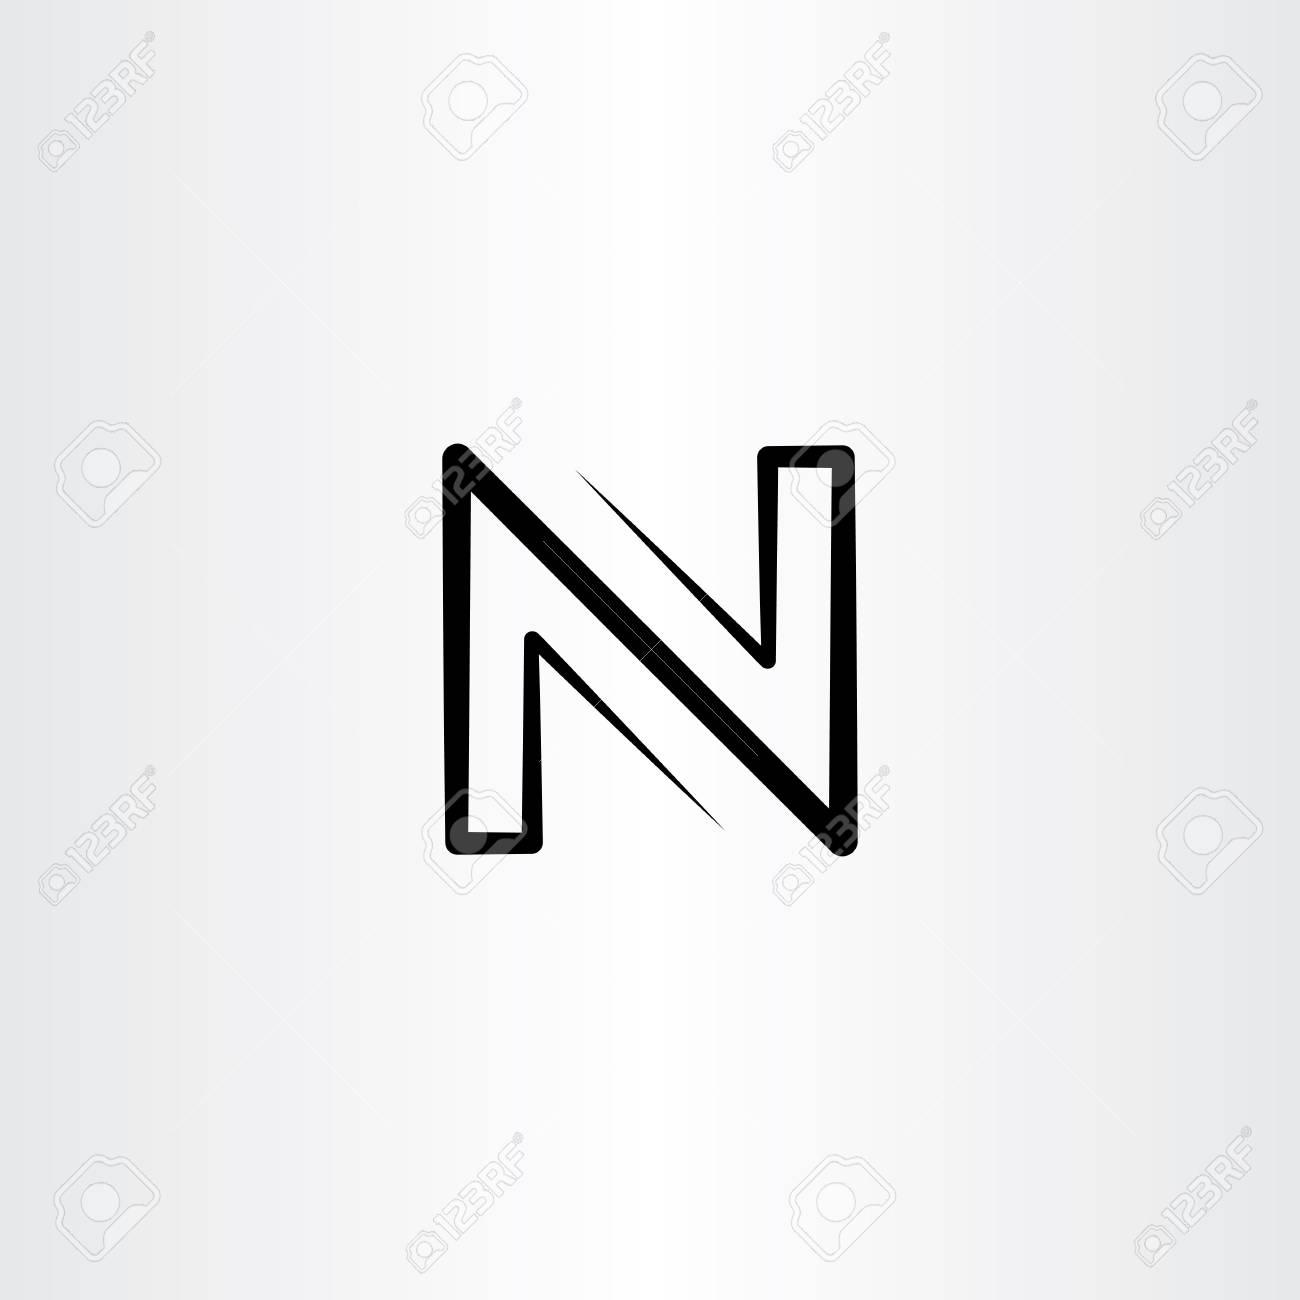 Black letter N logo vector sign icon - 90856507